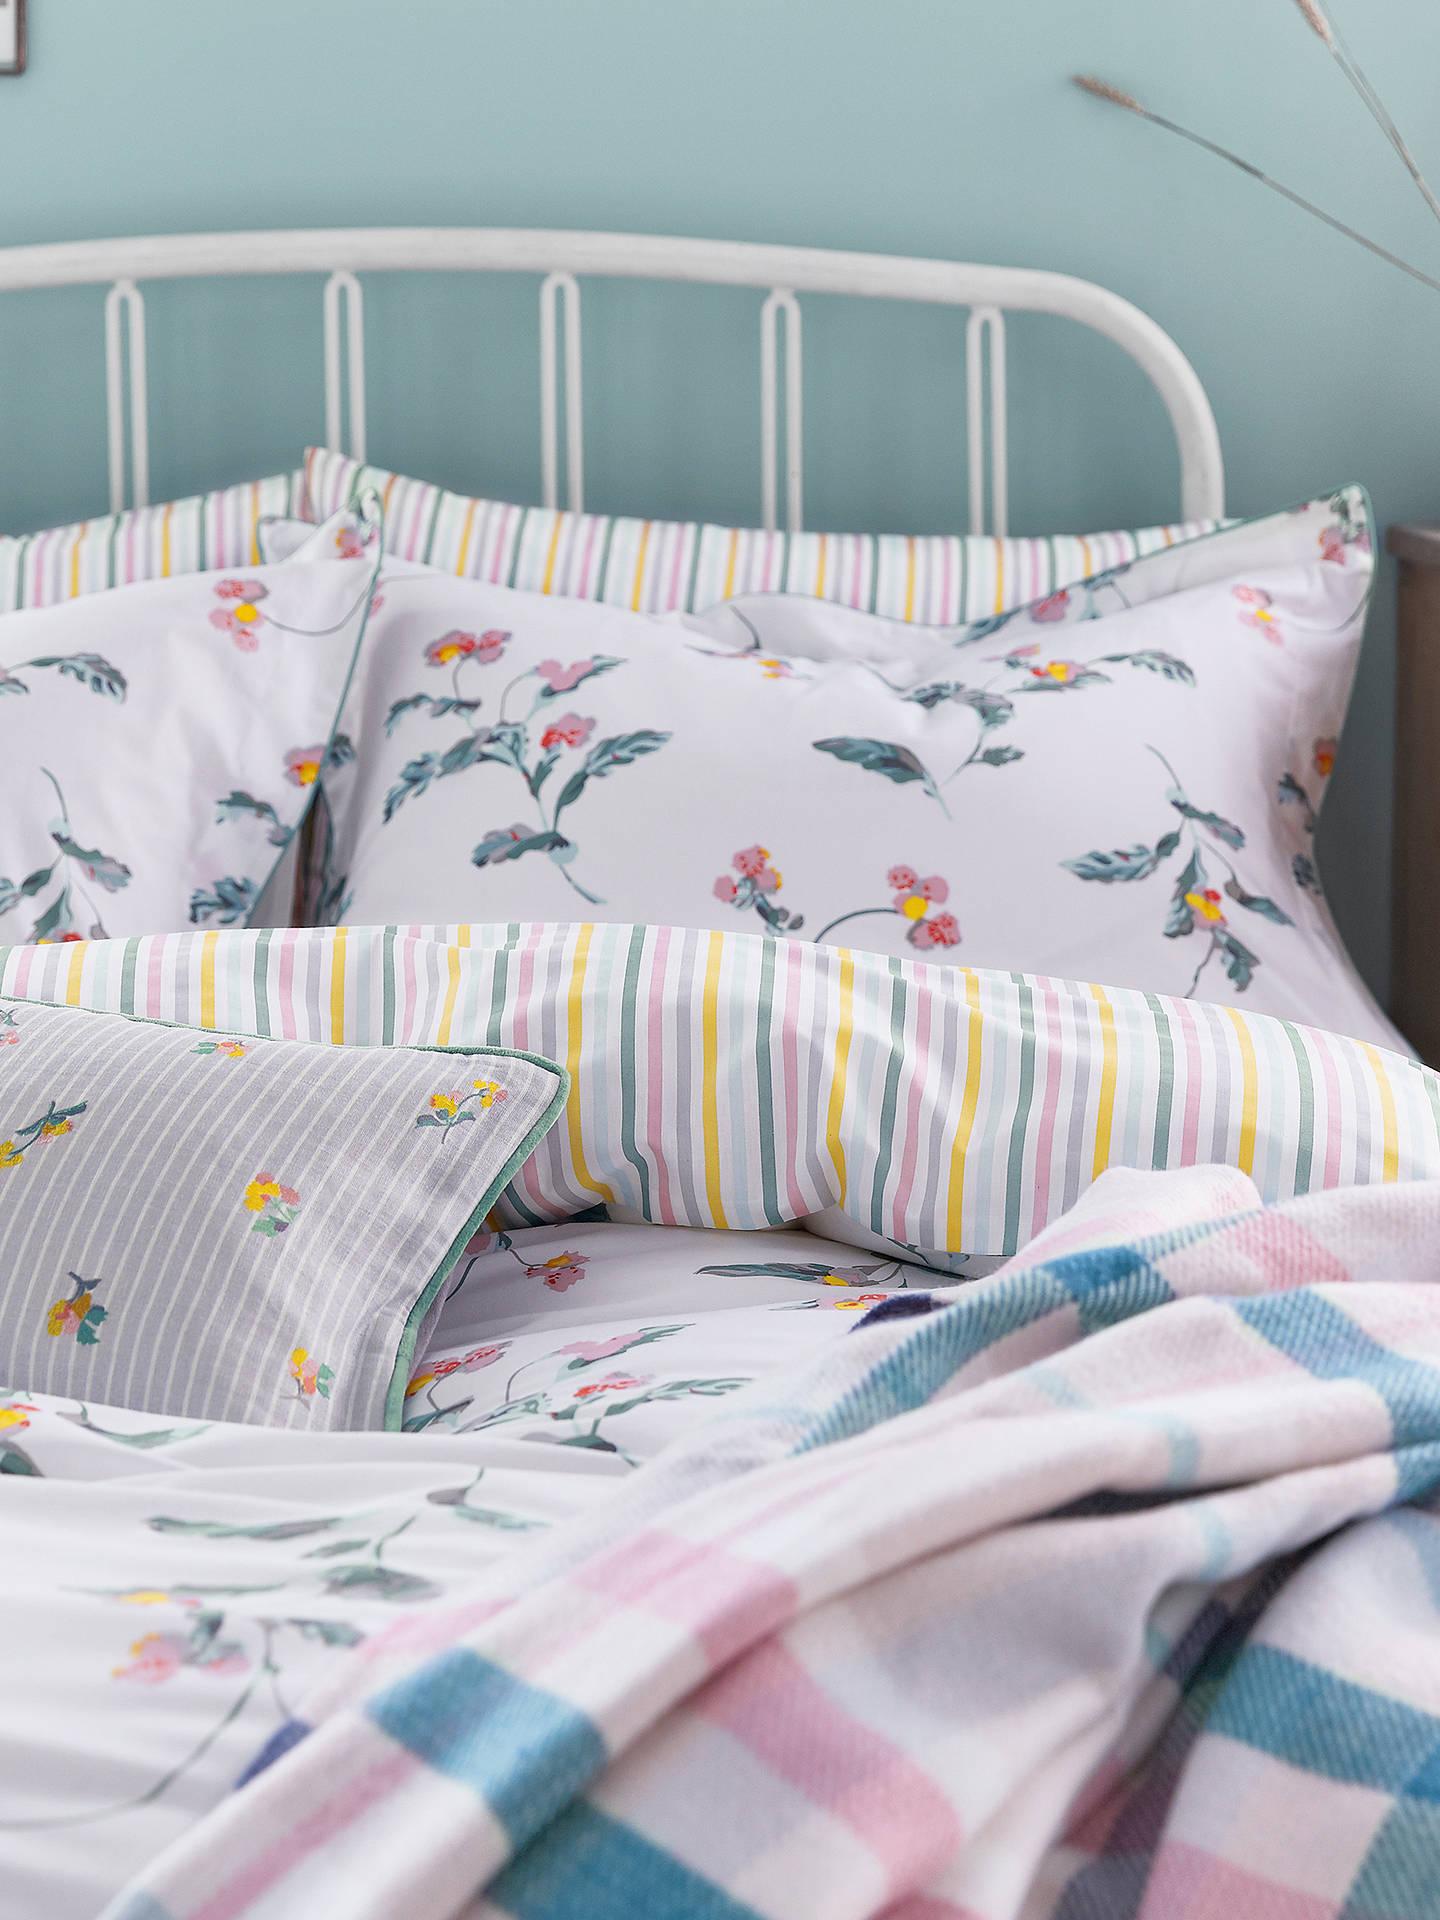 7d937acaa8288 ... Buy Joules Swanton Floral Single Duvet Cover, Multi Online at  johnlewis.com ...